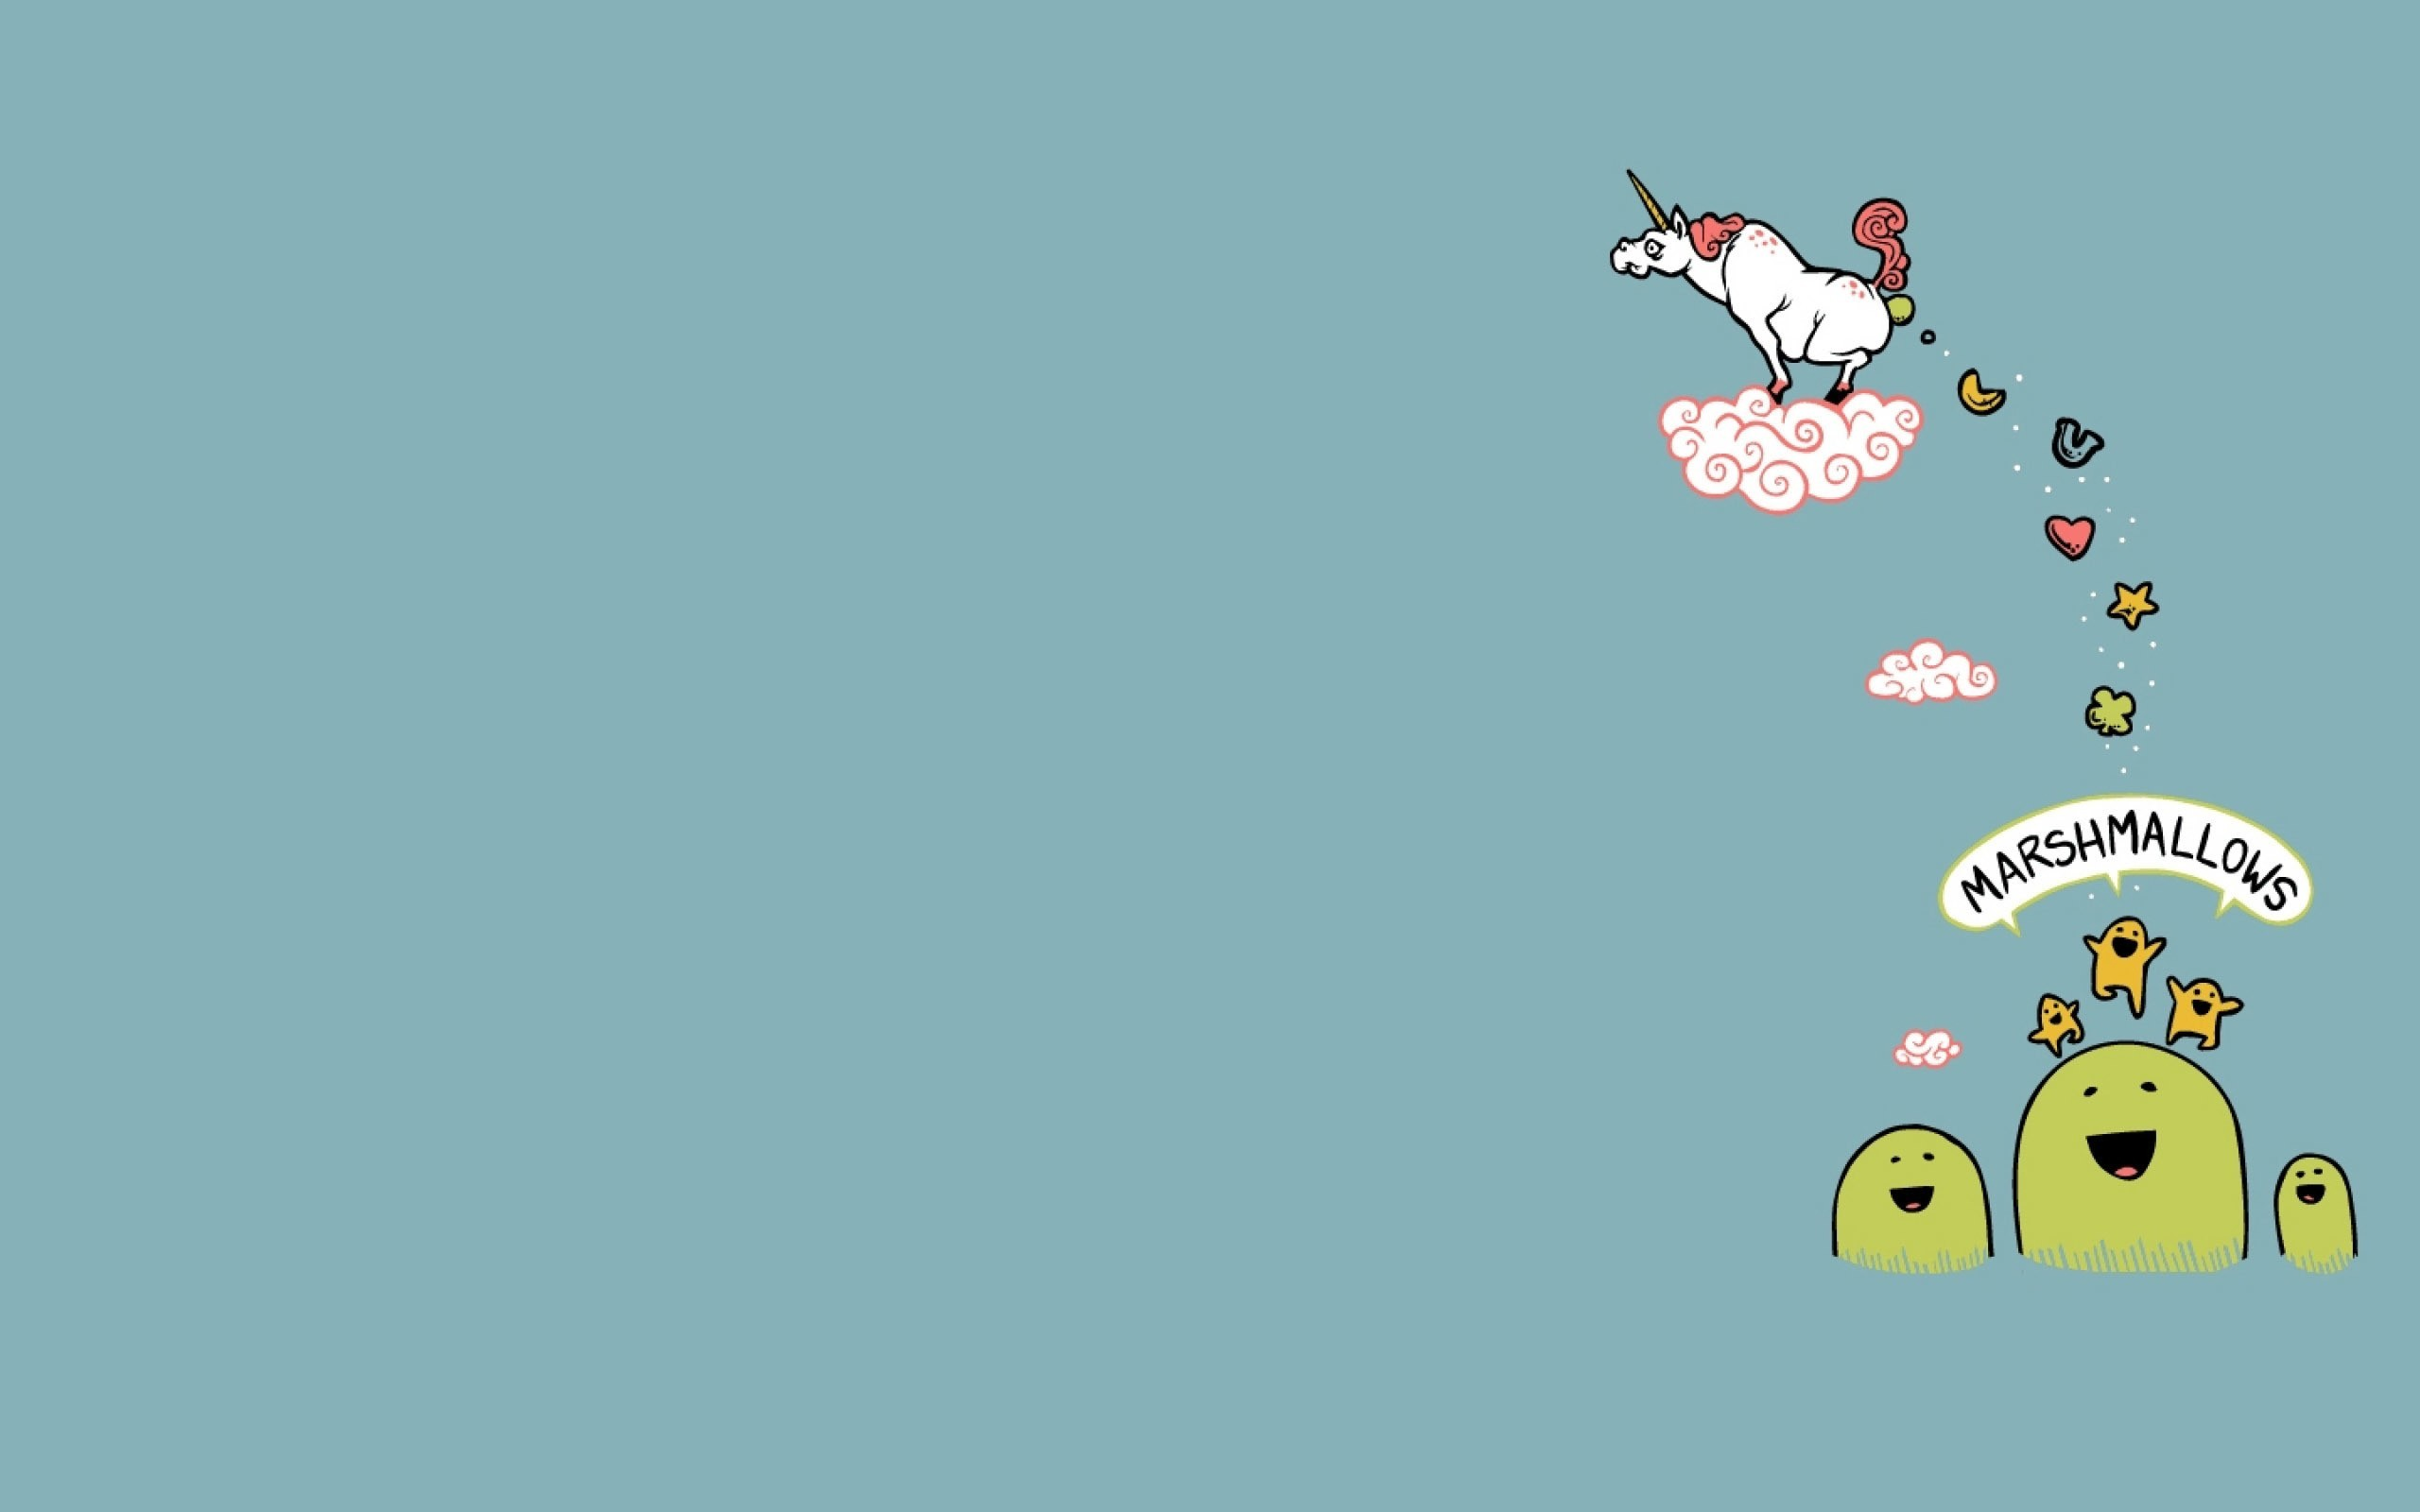 cute unicorn wallpapers - HD2560×1440